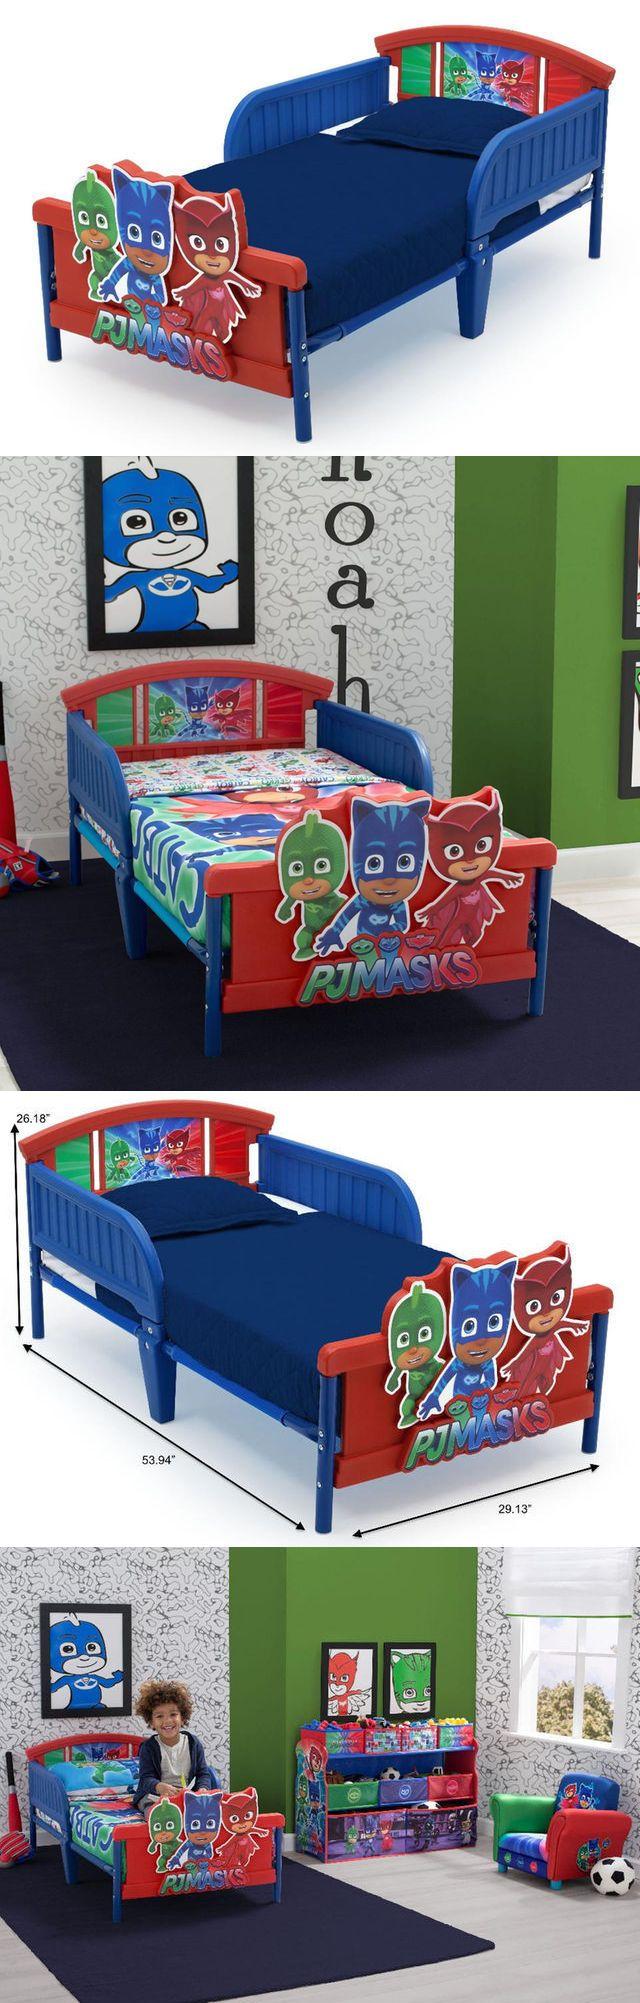 Other Nursery Bedding 20421: Pj Masks Toddler Bed Delta Furniture Junior Cot 3D Crib Size Girls Boys -> BUY IT NOW ONLY: $109 on eBay!